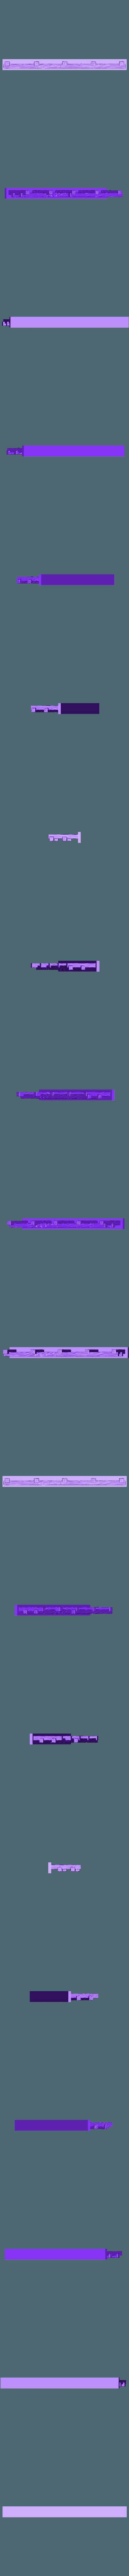 fence_3.stl Download free STL file Fence miniatures • 3D printing model, Ilhadiel